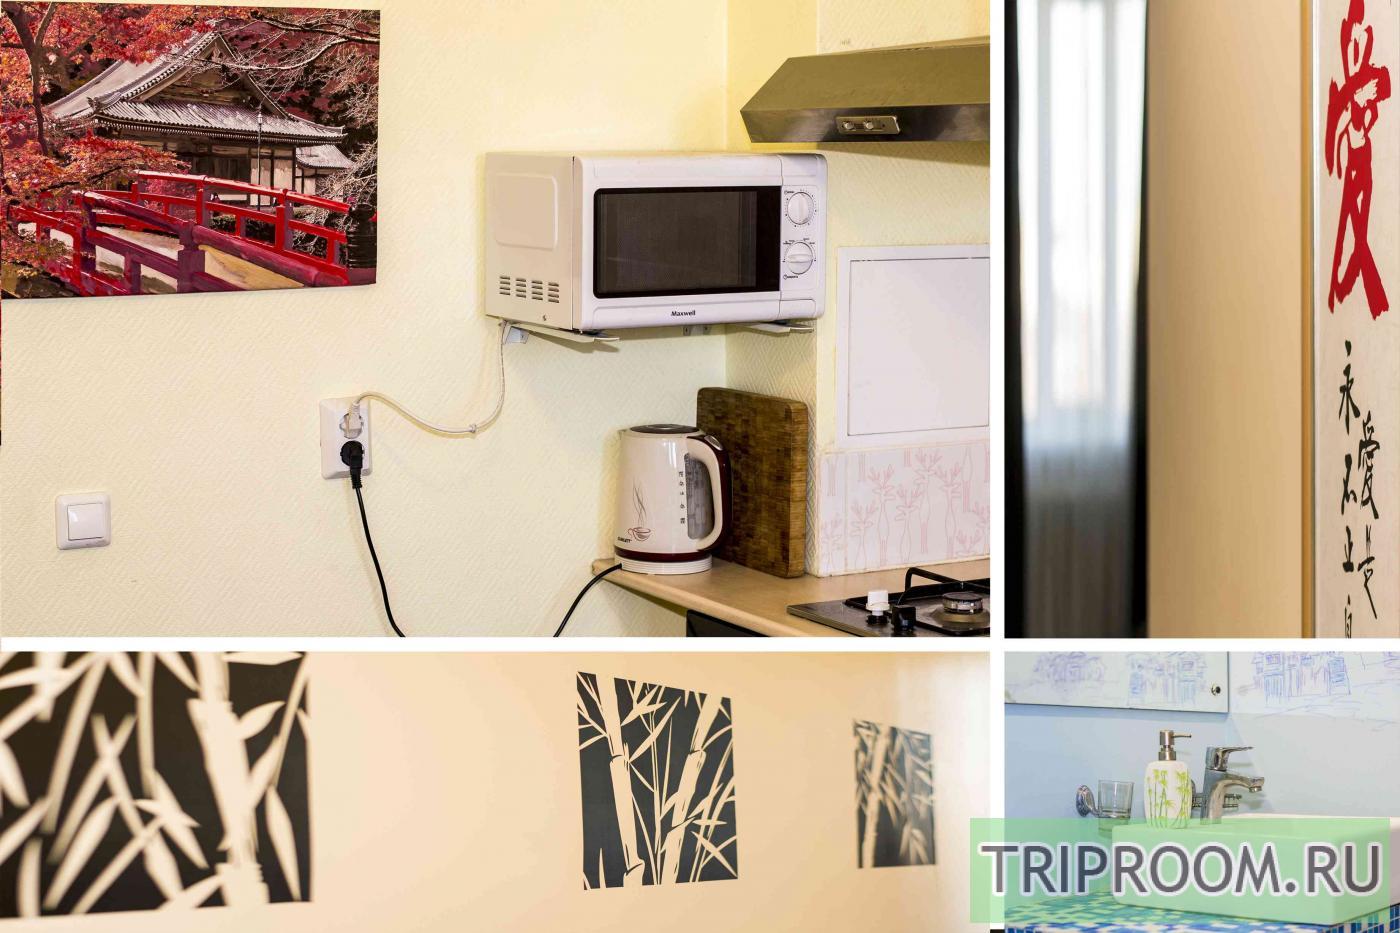 1-комнатная квартира посуточно (вариант № 14712), ул. Петра Смородина улица, фото № 3